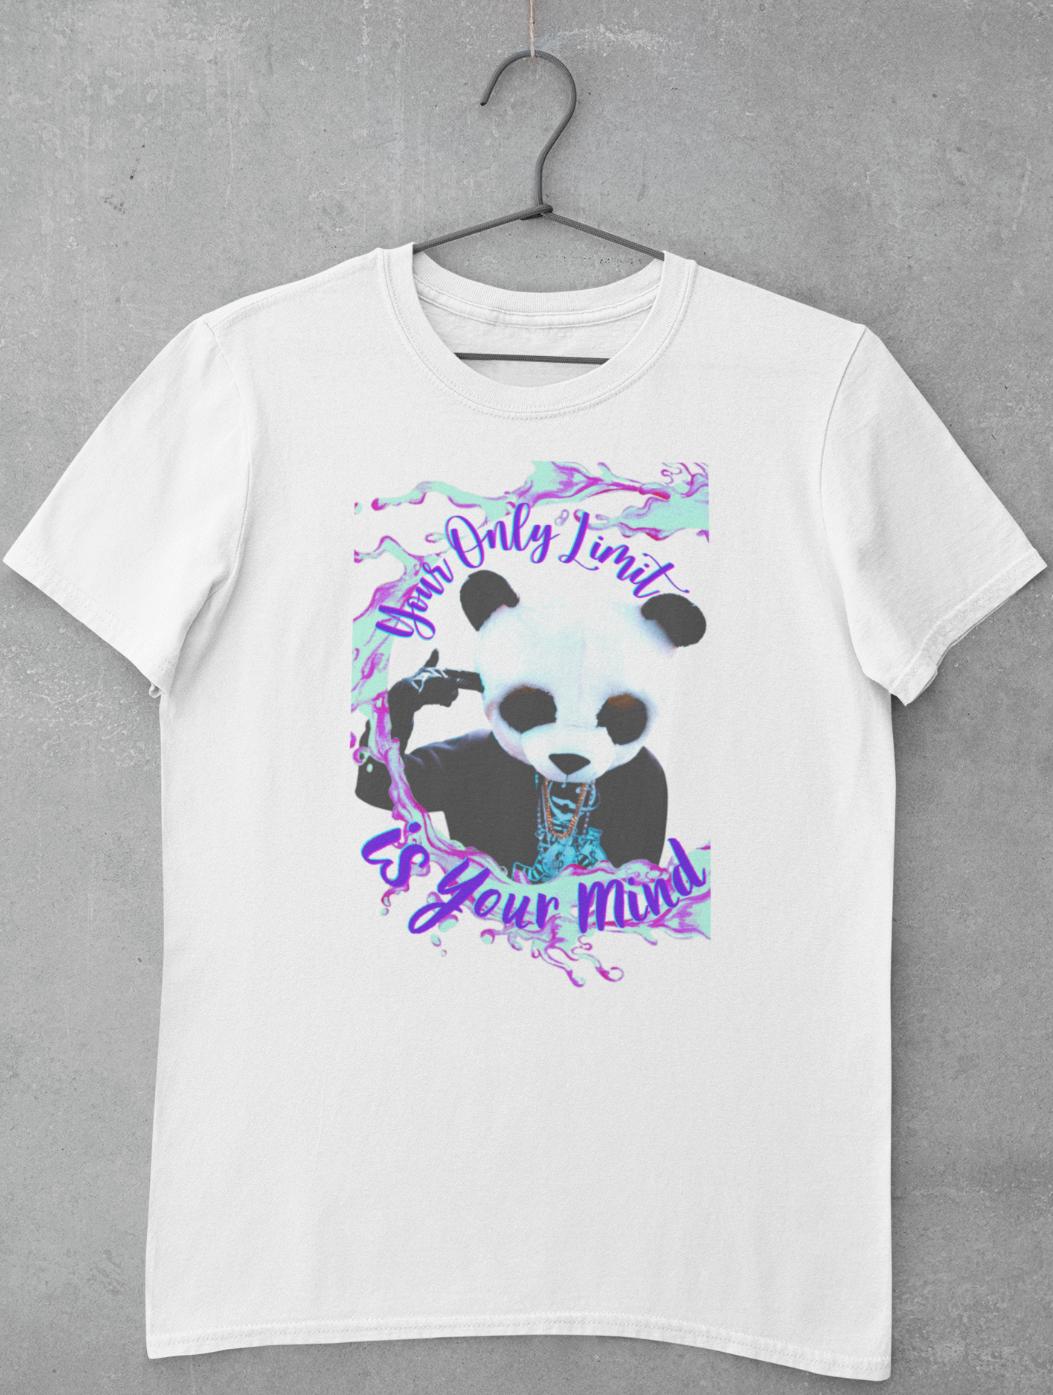 Panda Your Only Limit T-Shirt | Panda Bear Graphic Design Tee | Ships Free!